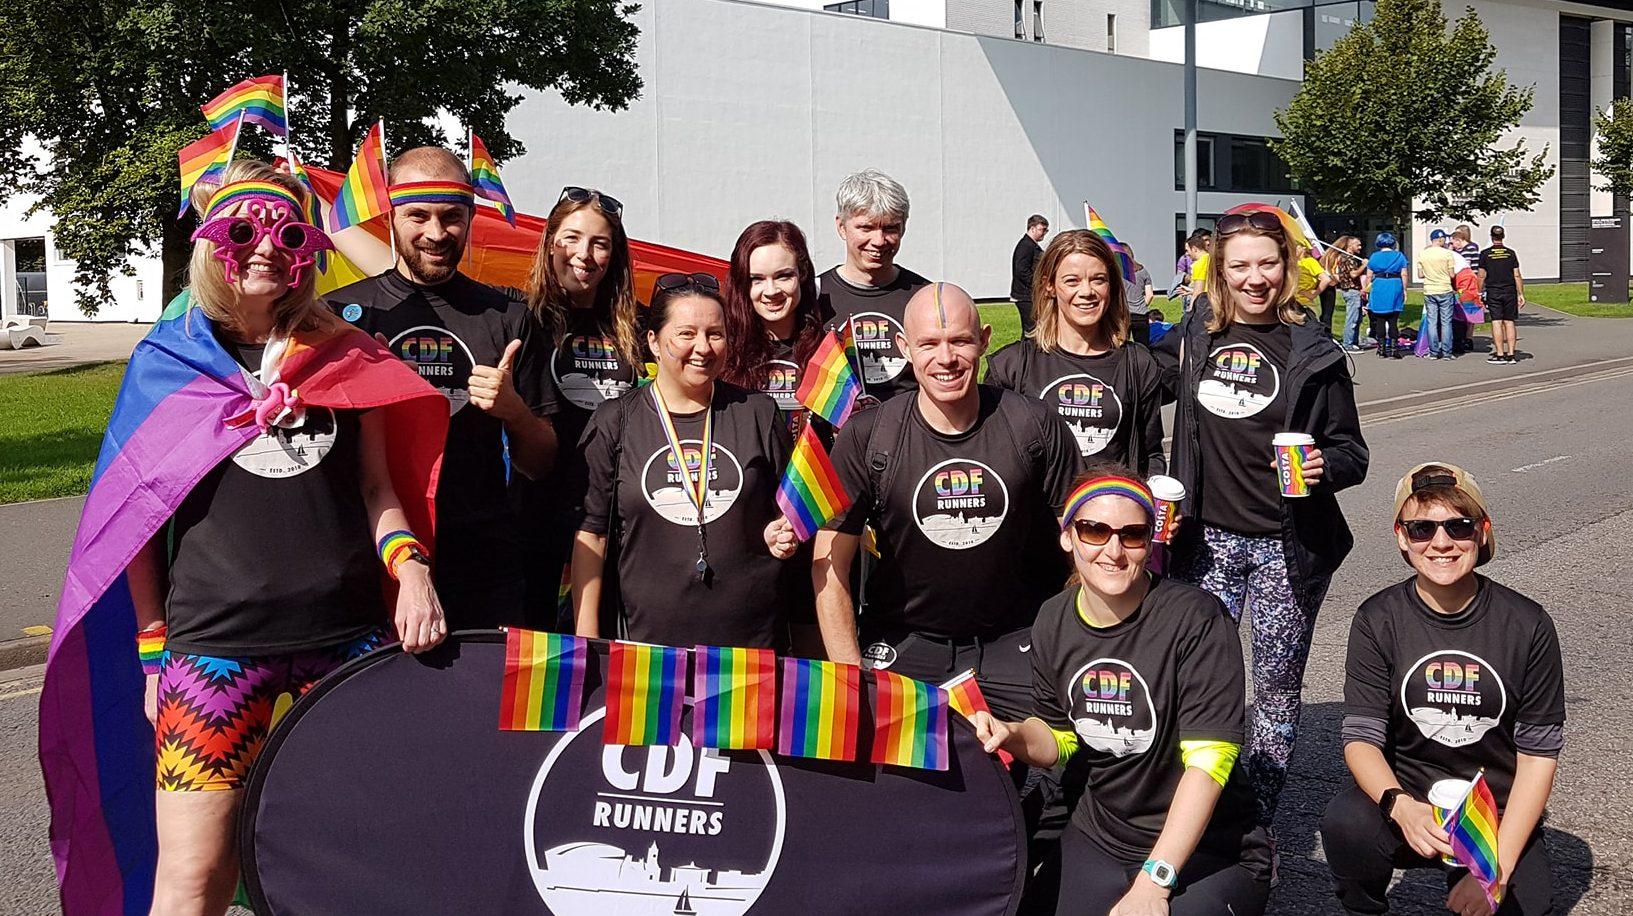 🏳️🌈 Cardiff Running Pride 🏳️🌈